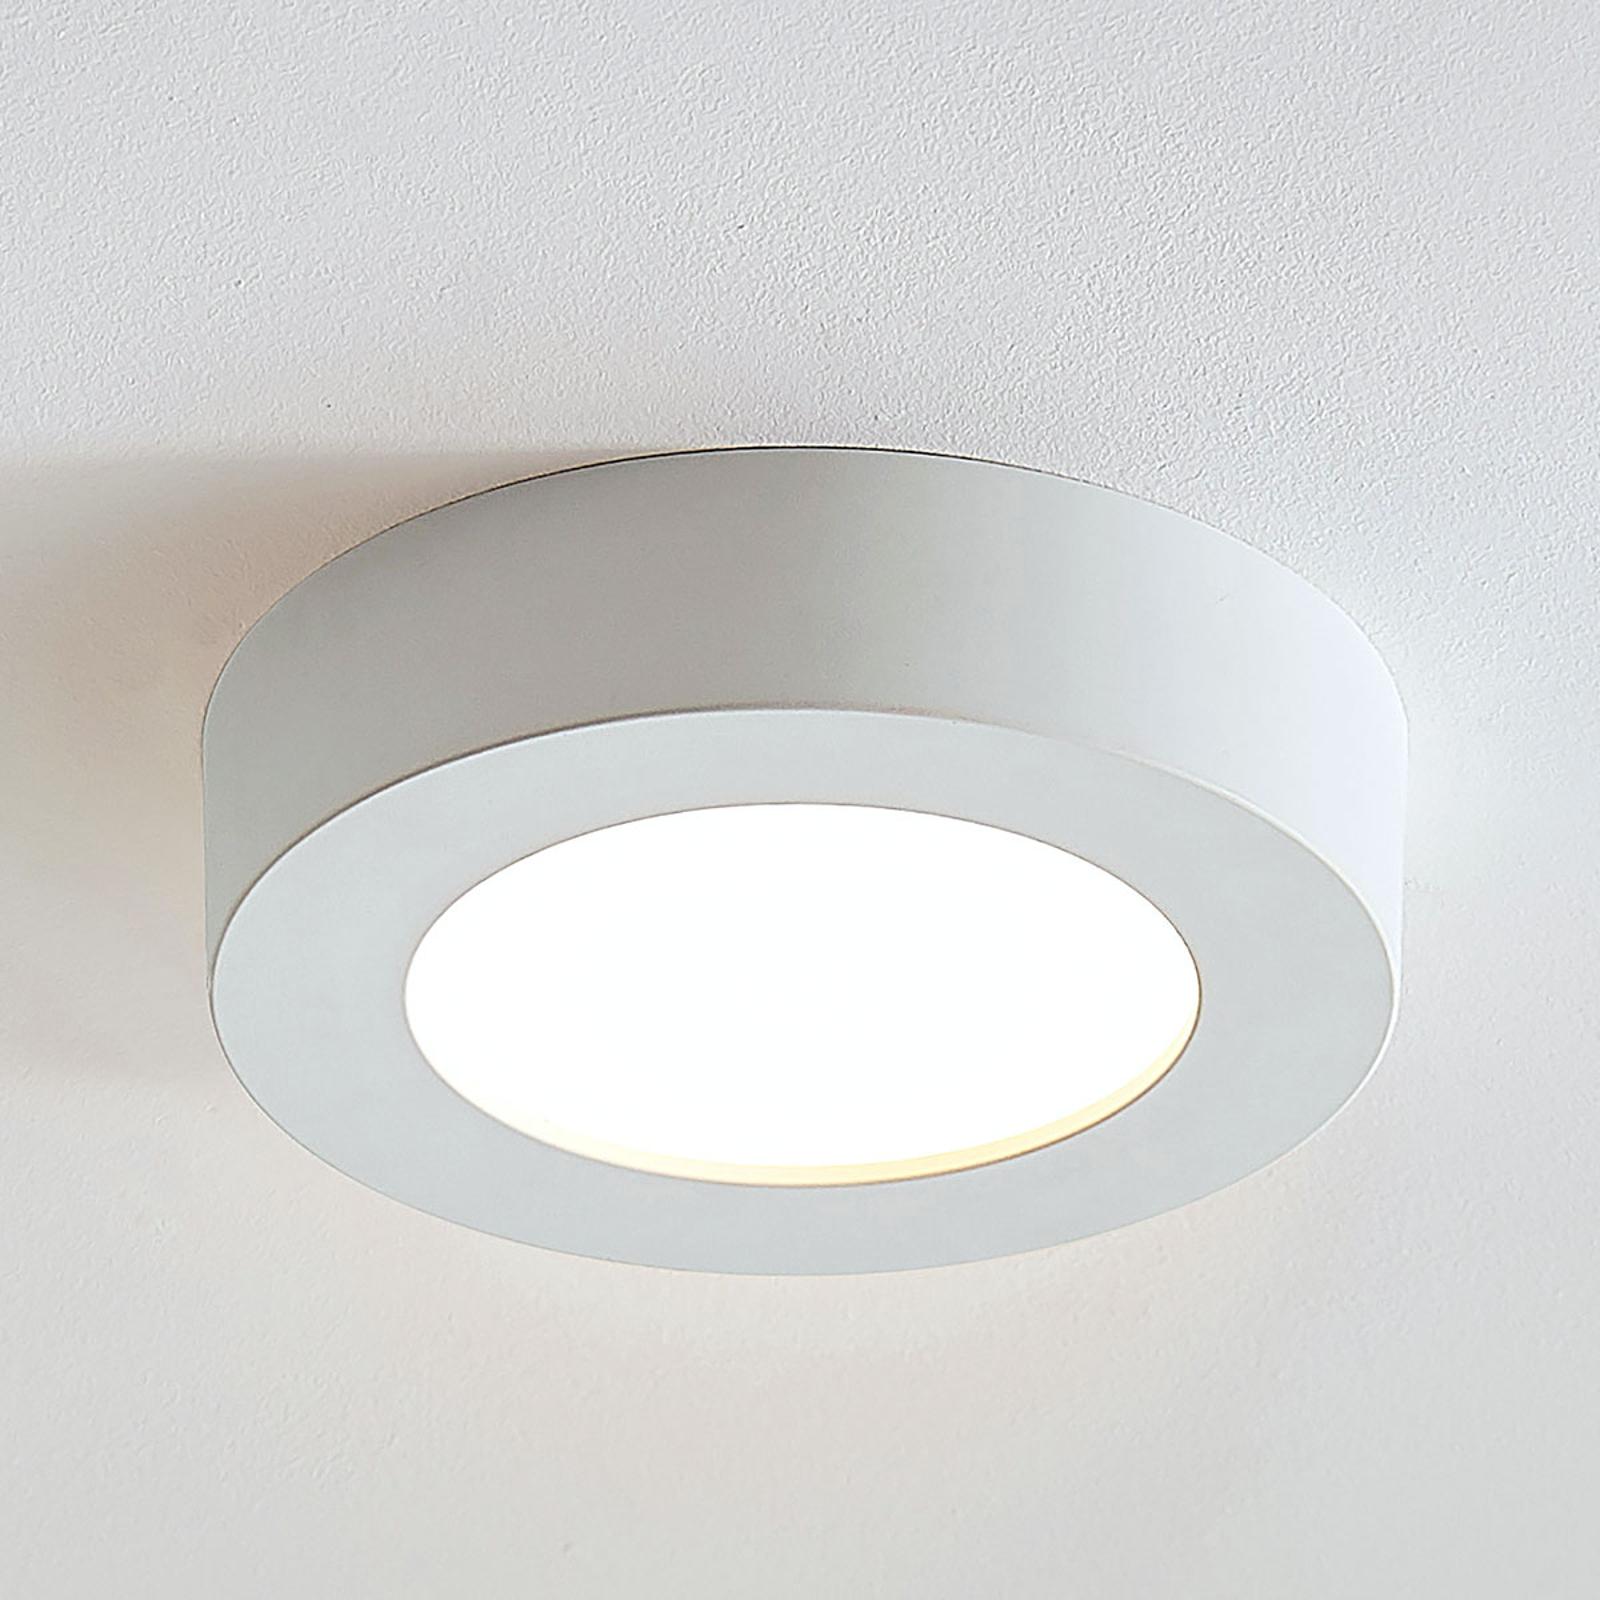 LED plafondlamp Marlo wit 3.000K rond 18,2cm